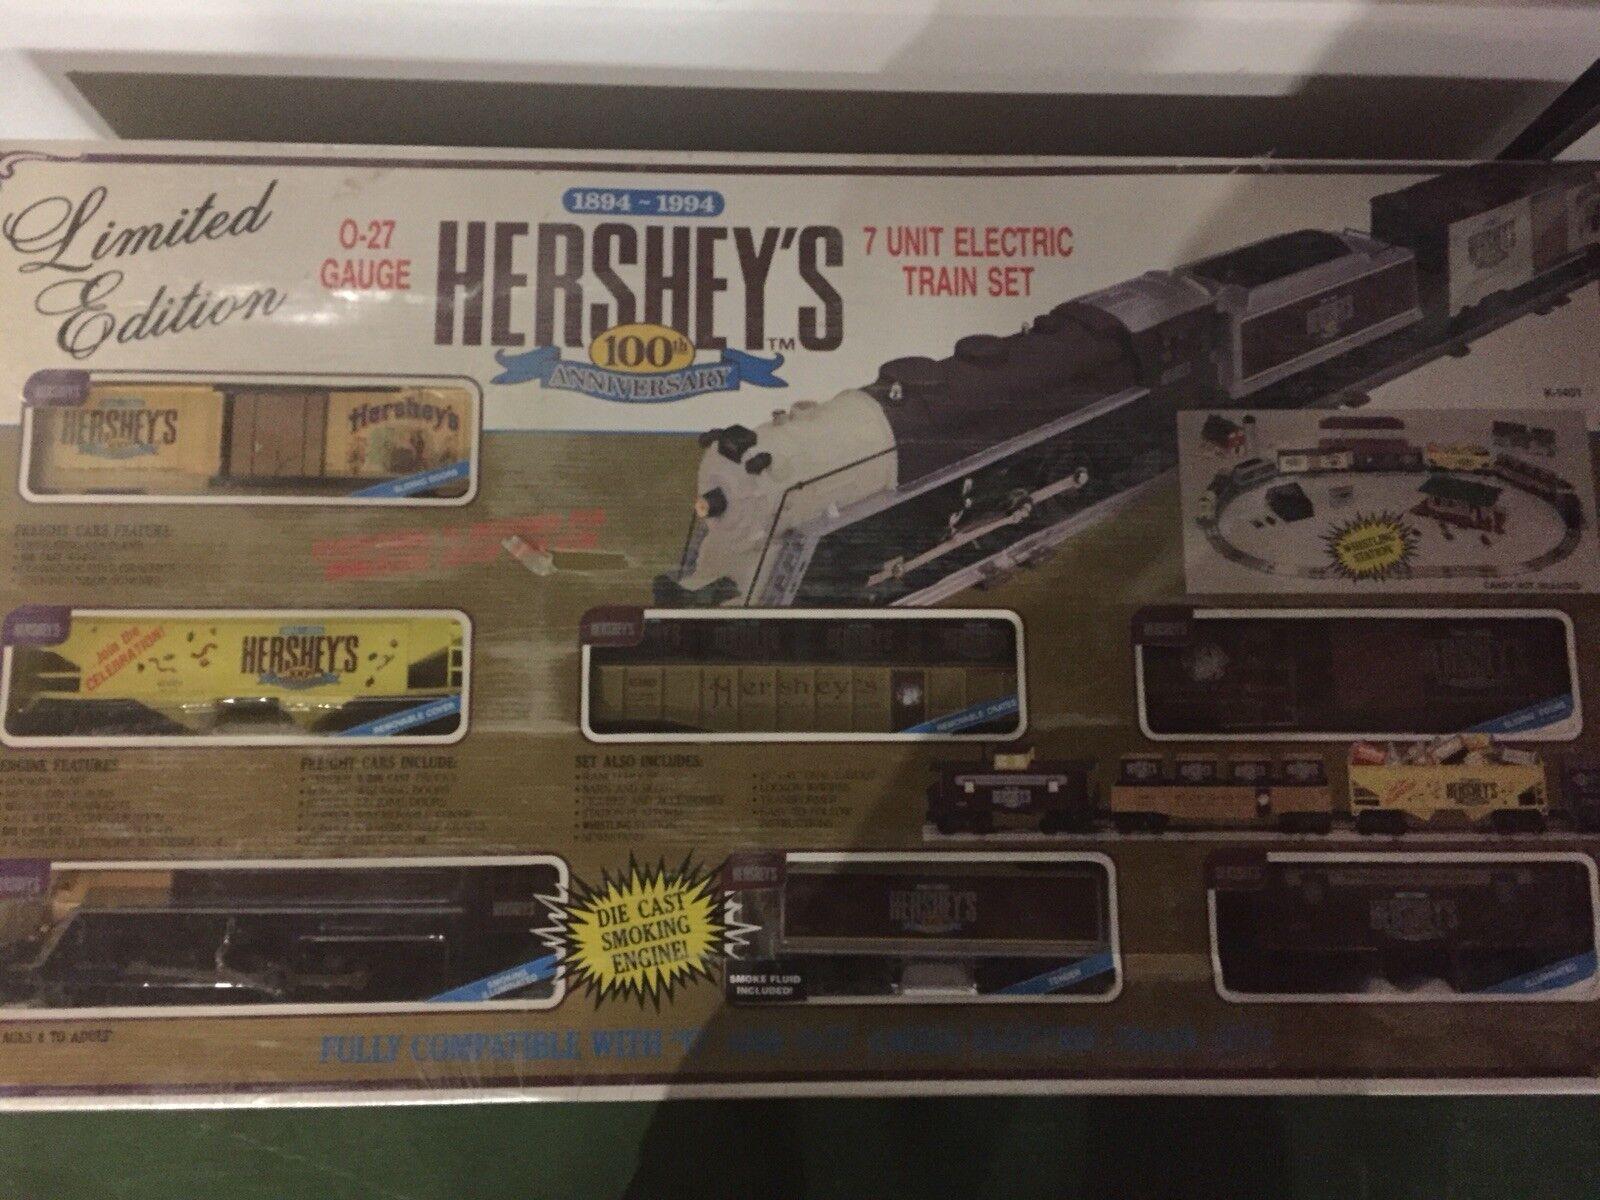 K-Line  K-1401 Hershey's 100th Anniversary Train Set autos autos autos 0c4275